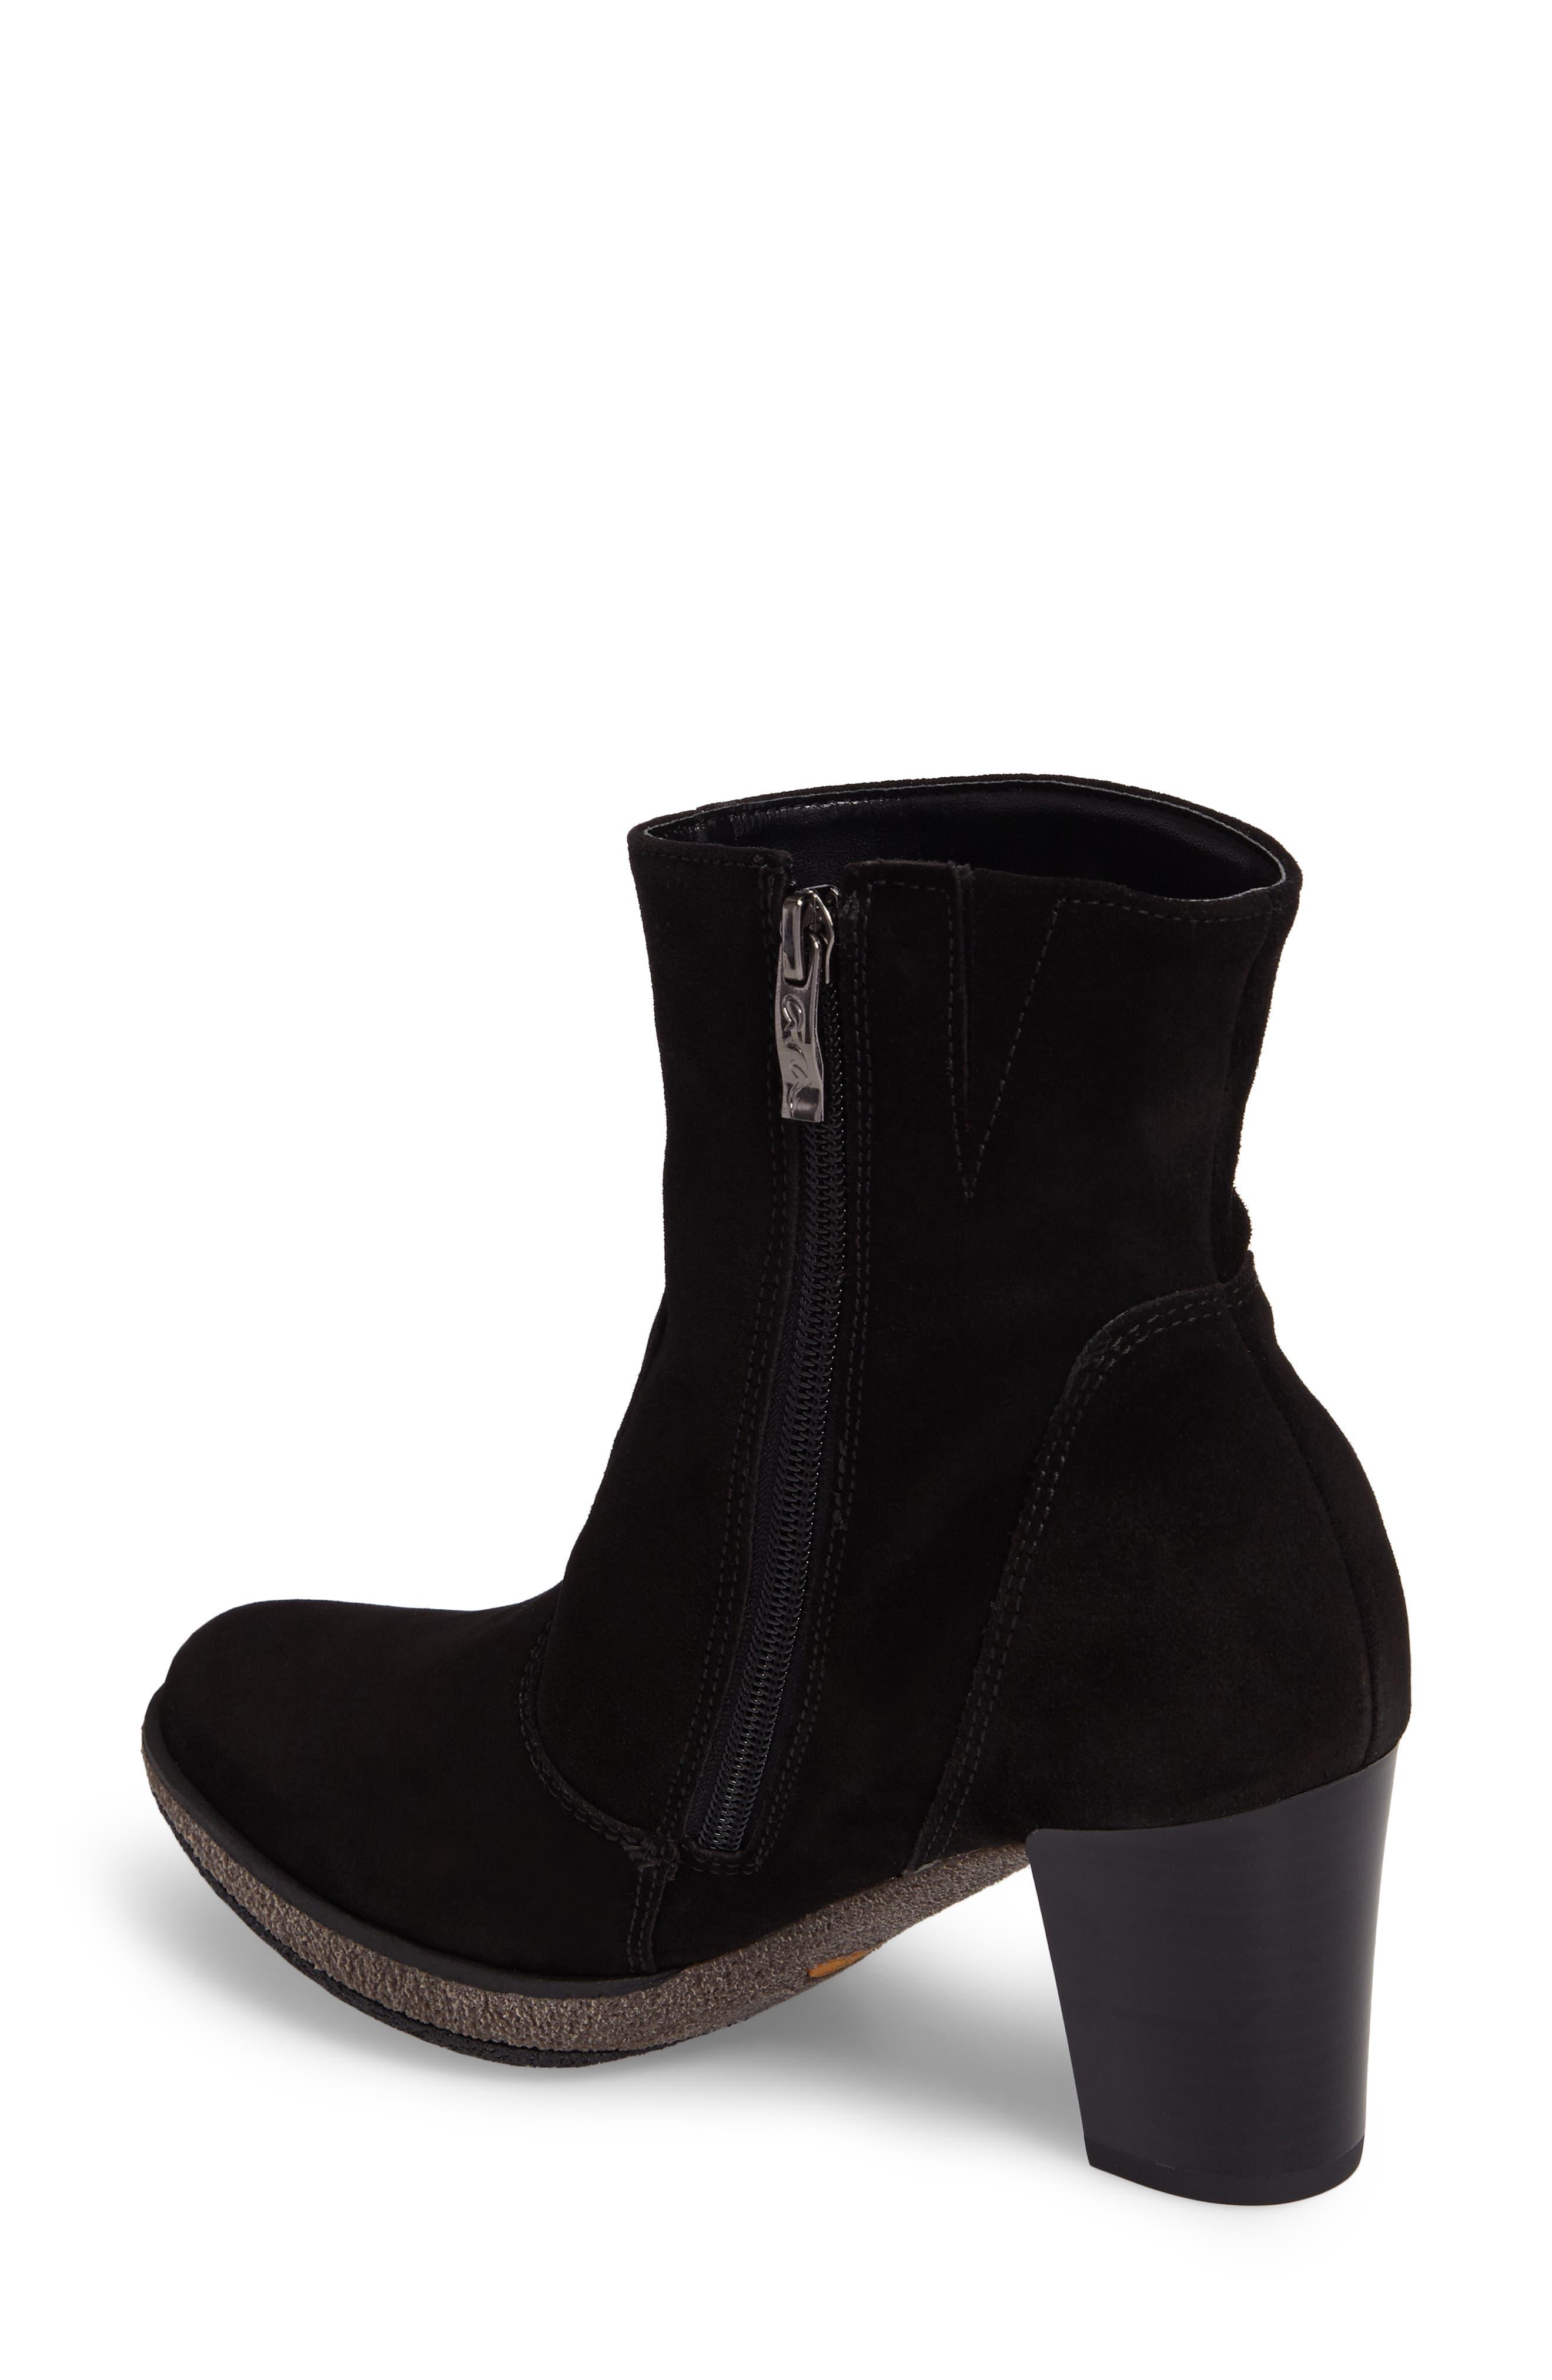 Bristol Bootie,                             Alternate thumbnail 2, color,                             Black Leather